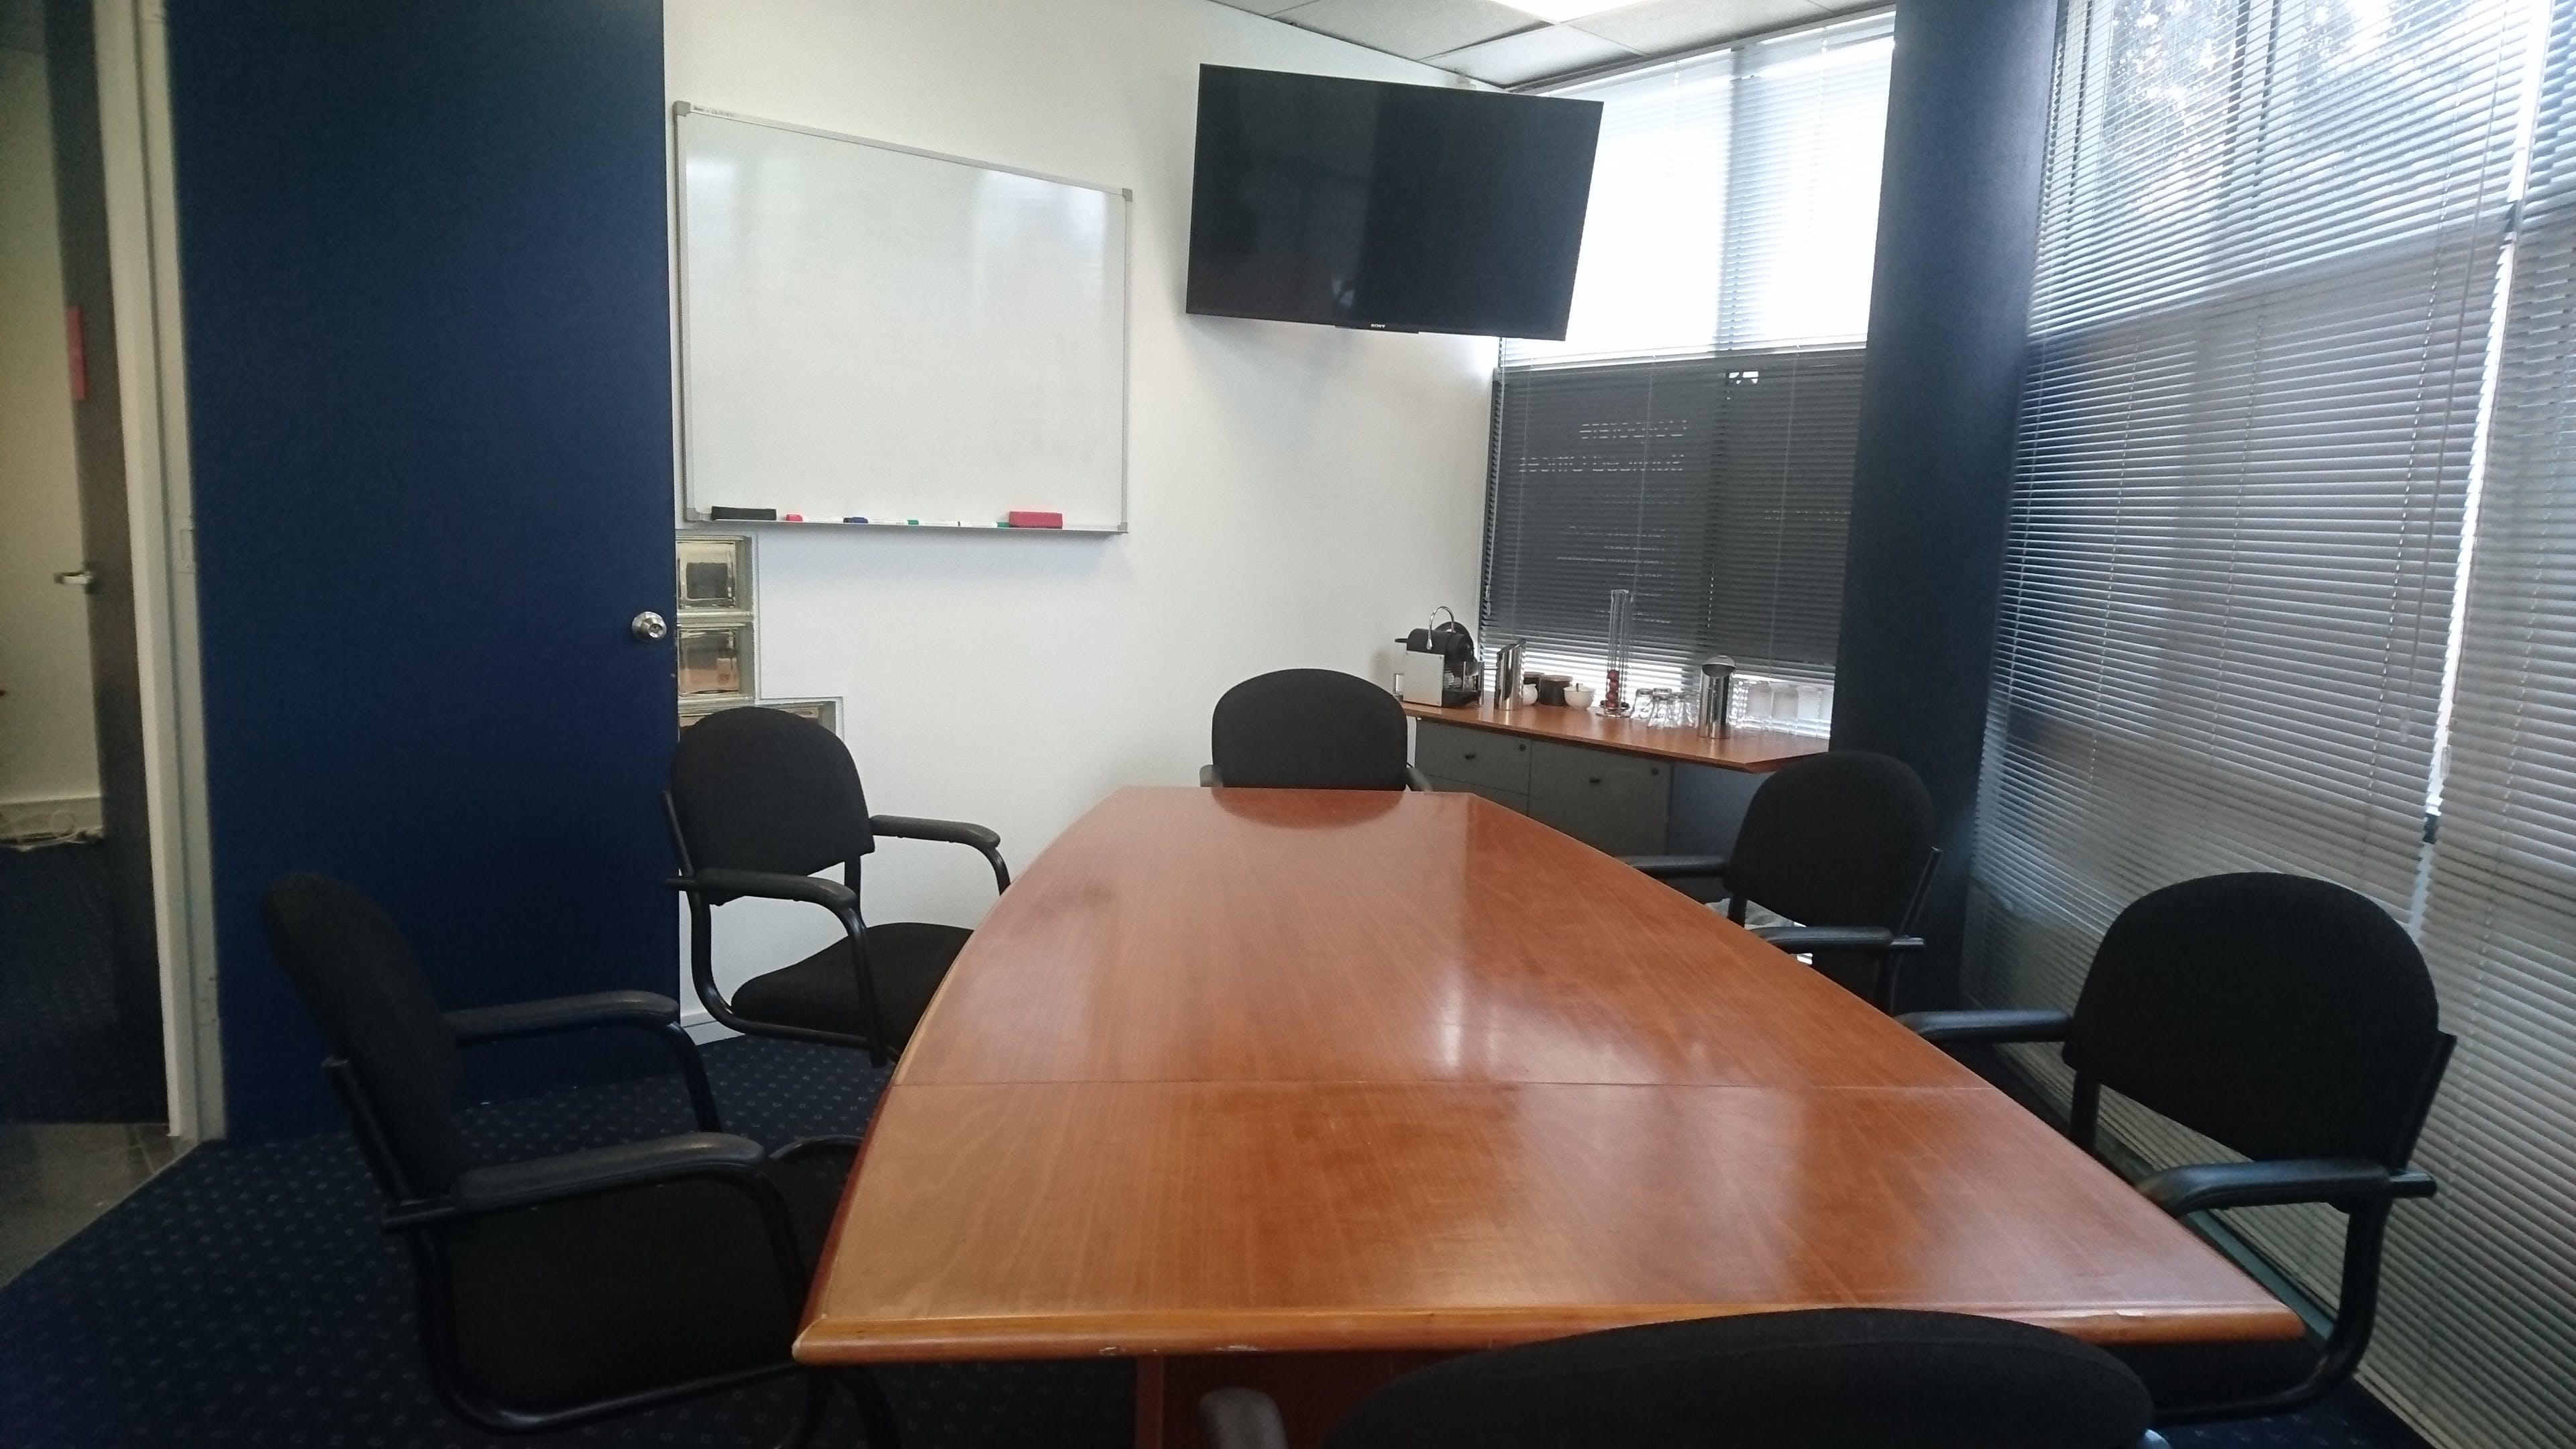 Boardroom, meeting room at CSO Carlton, image 1